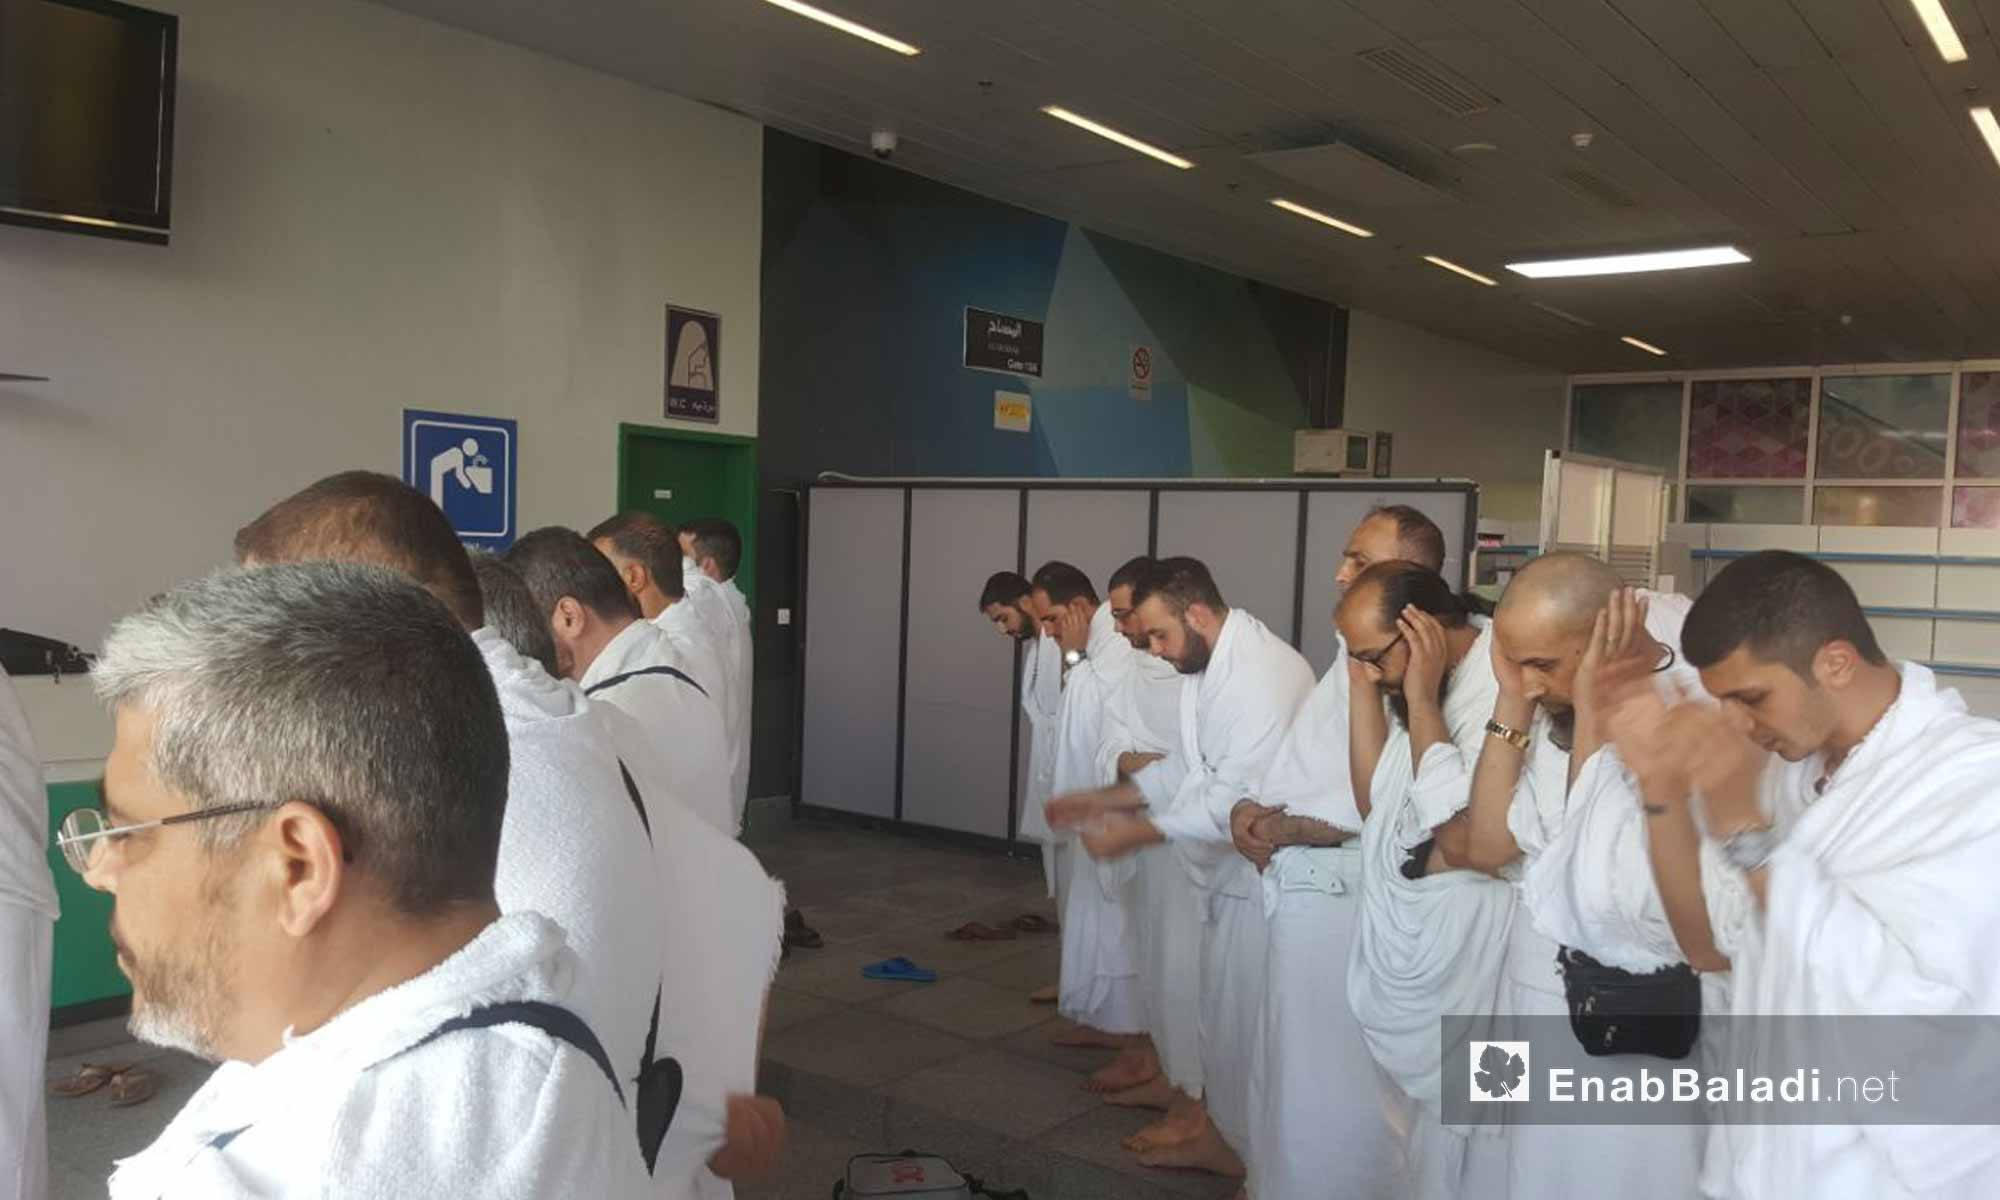 Syrian pilgrims arrive at Jeddah Airport, Saudi Arabia – August 4, 2018 (Enab Baladi)